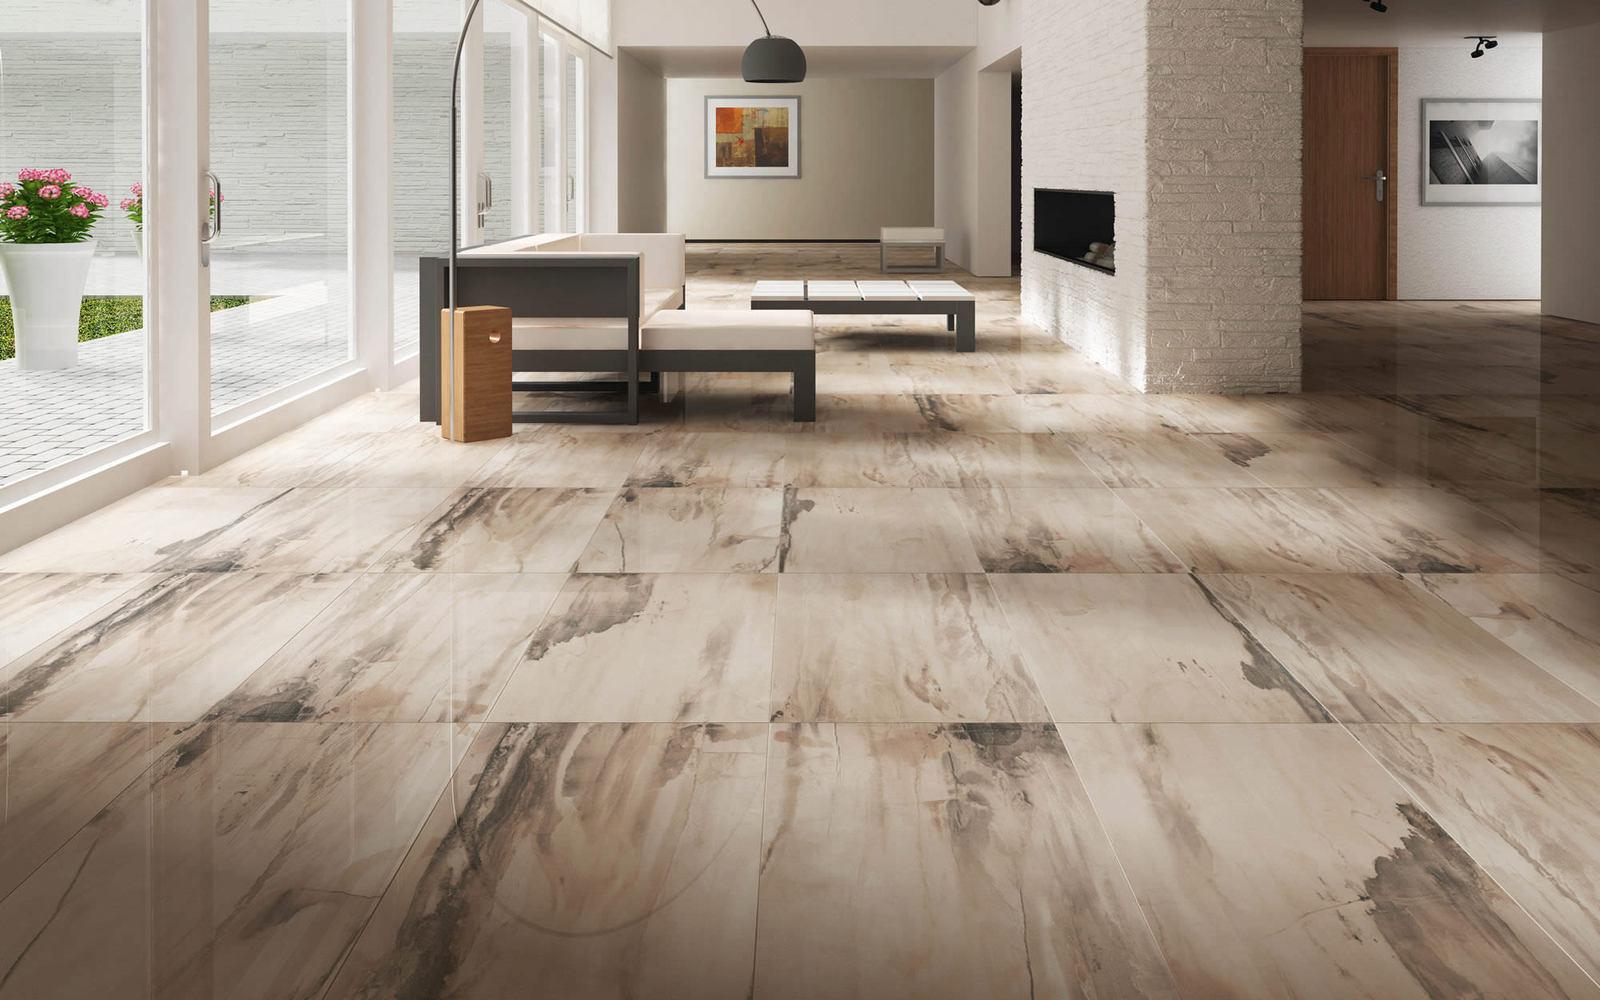 https://nimvo.com/wp-content/uploads/2017/10/Living-Room-Flooring.jpg